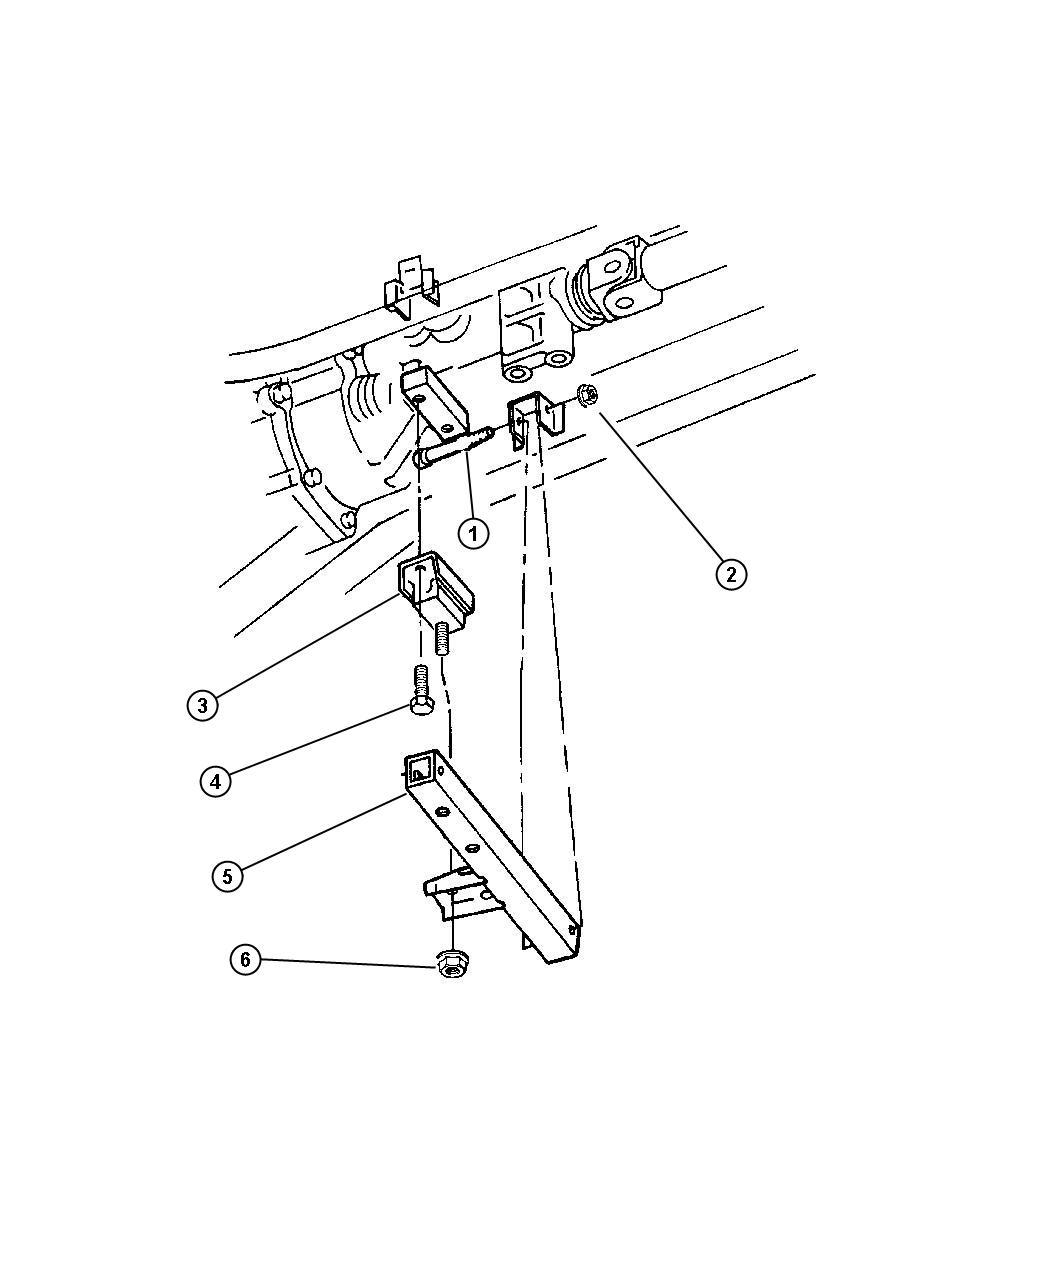 Dodge Viper Isolator. Transmission mount. Transmission